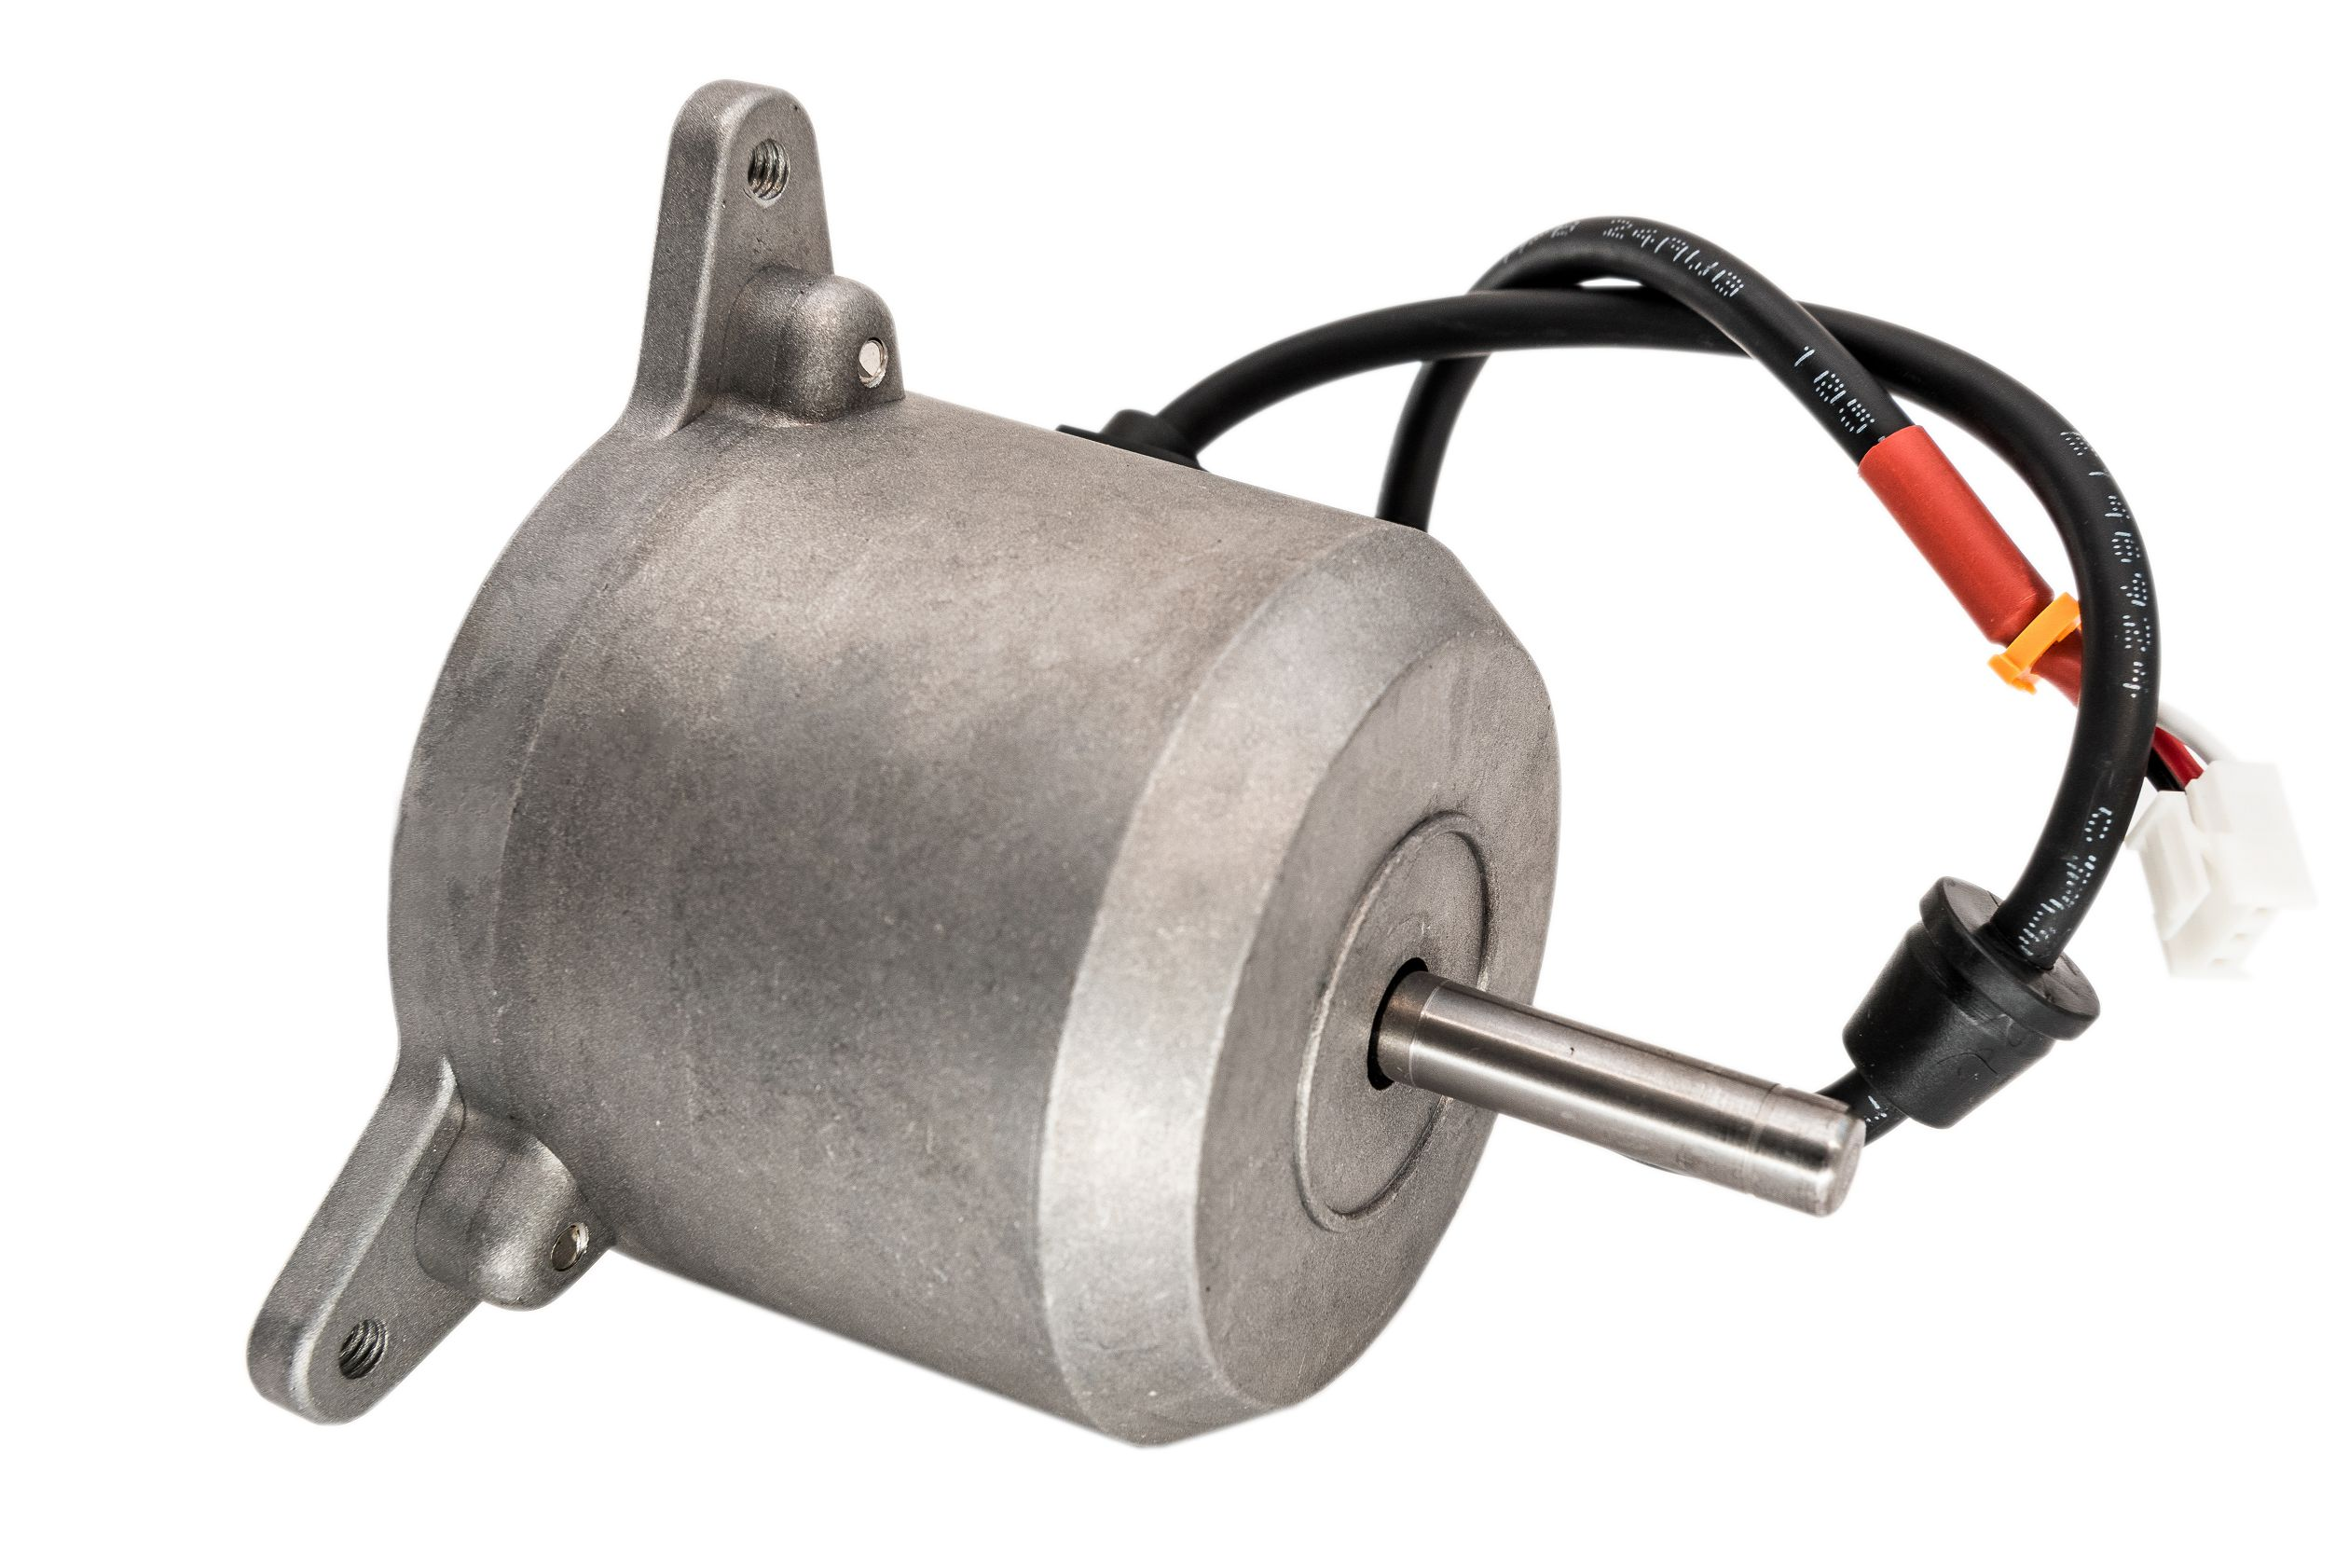 120W BLDC Range Hood Motor